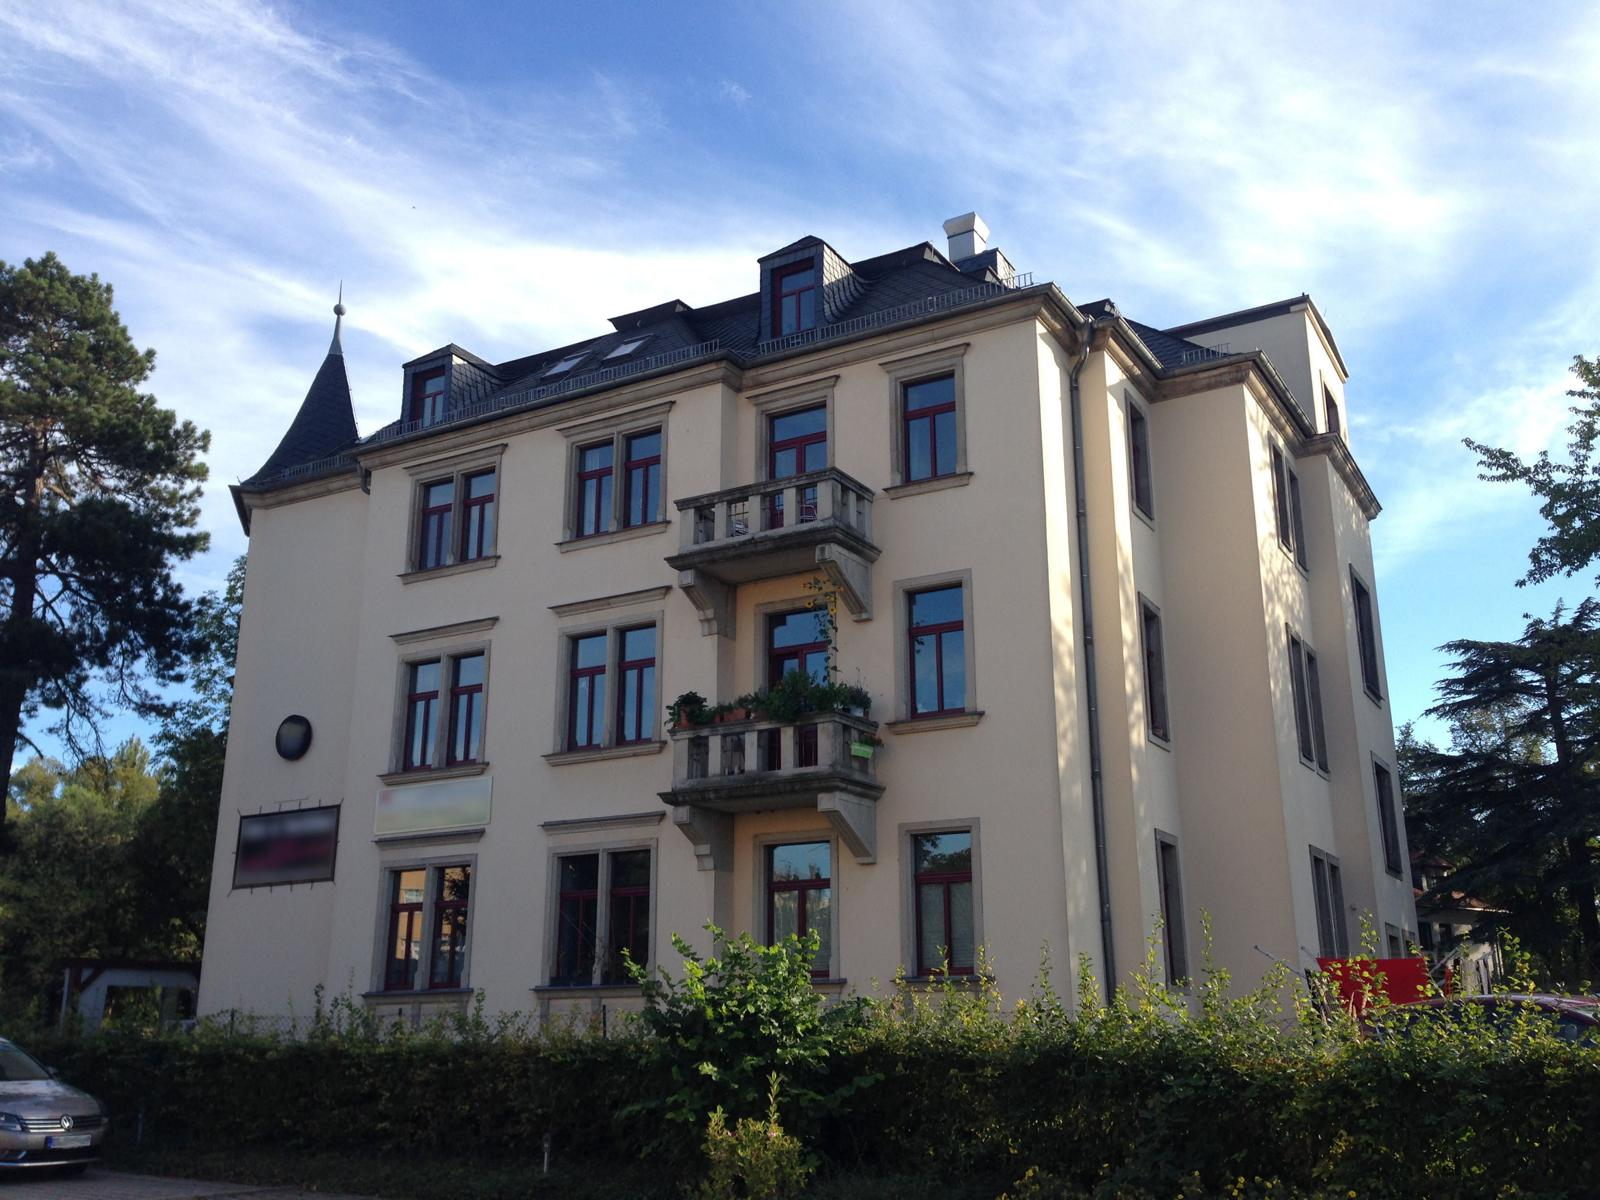 Wilhelm-Franke-Straße 8